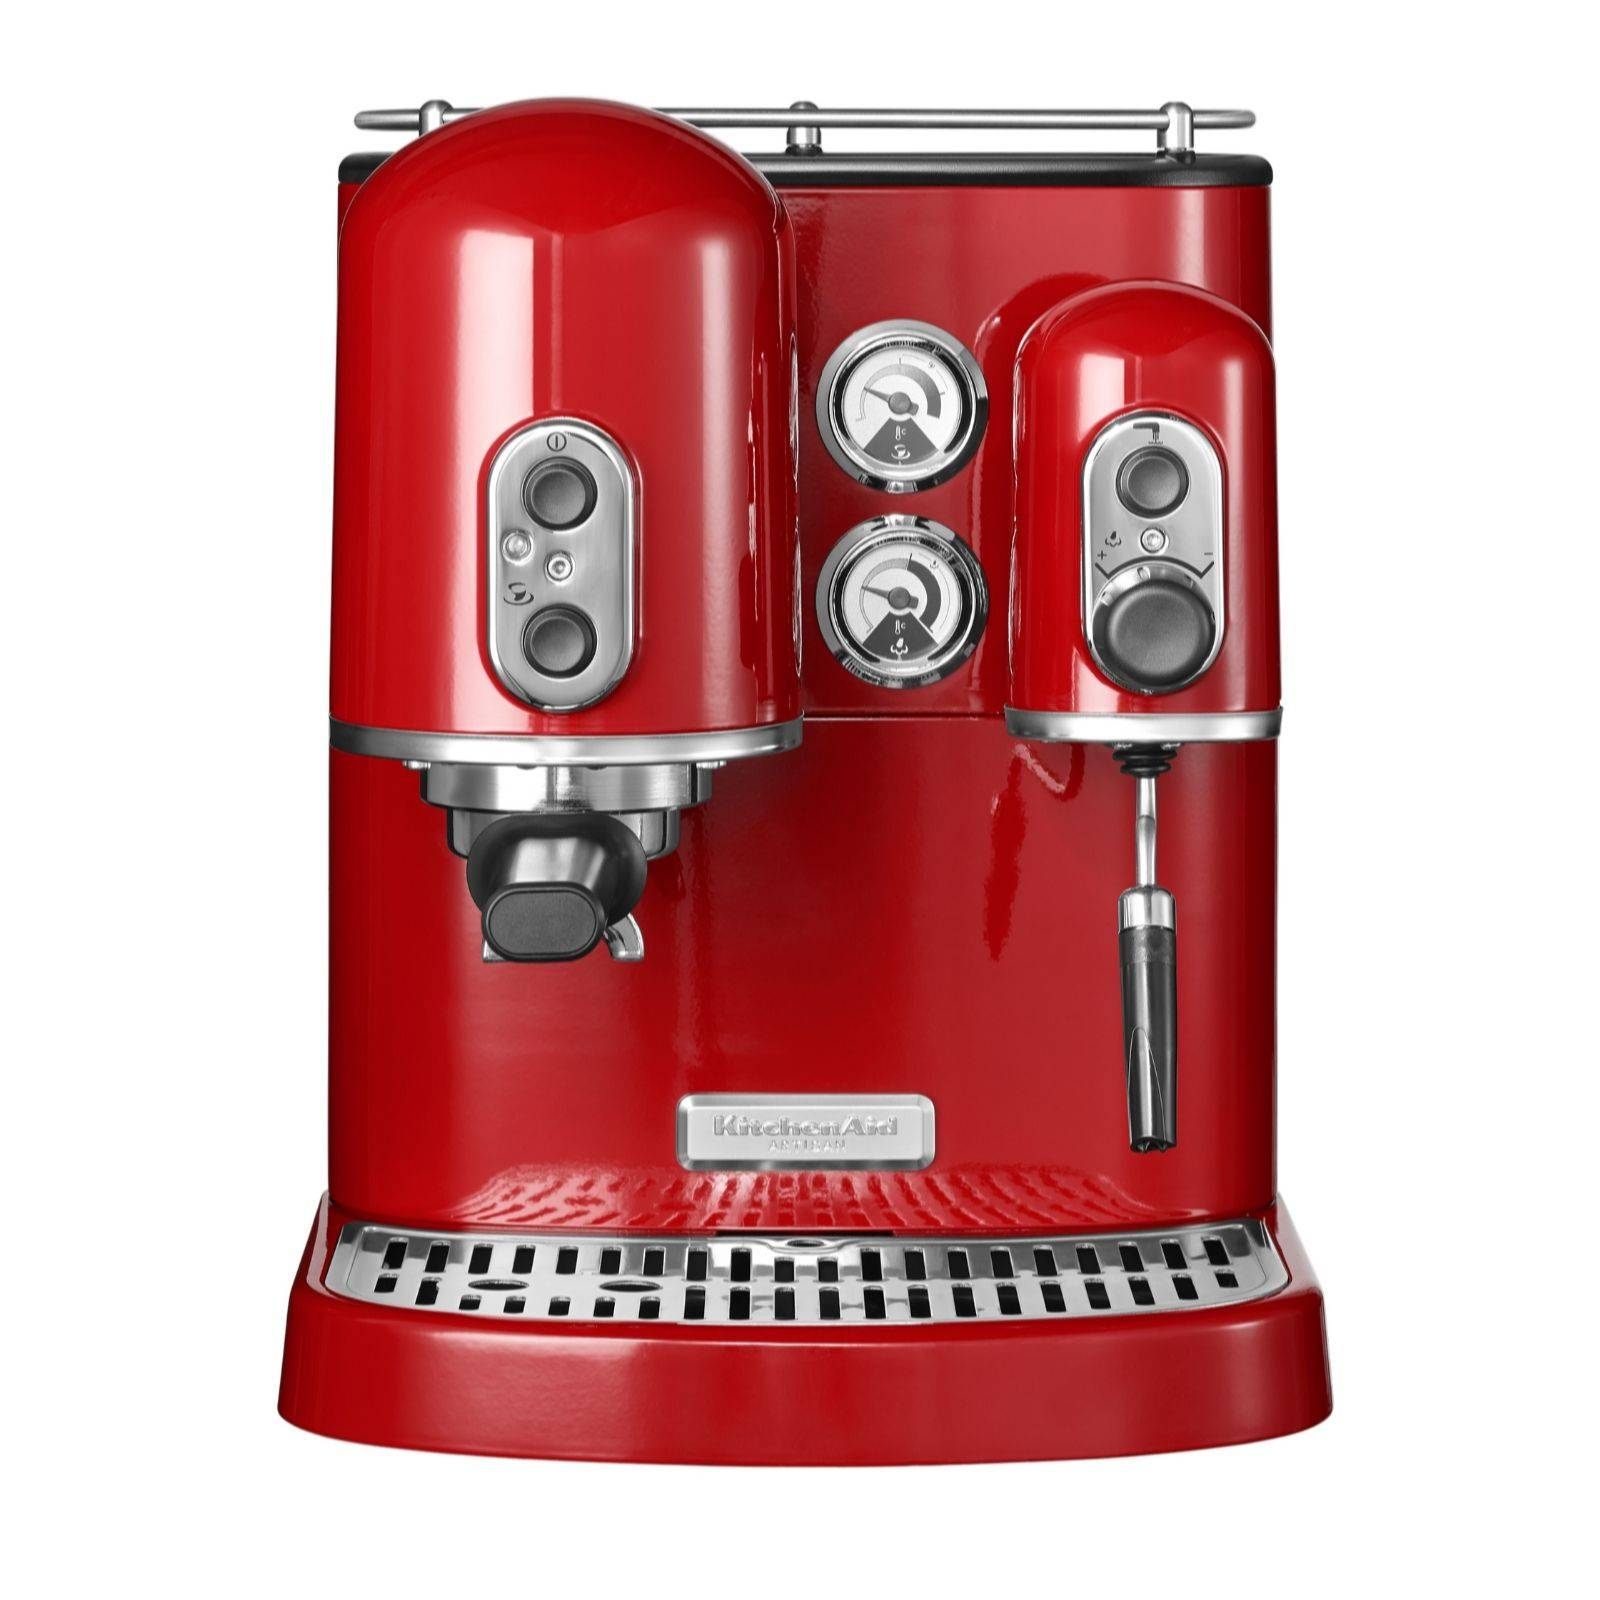 KitchenAid Artisan Espresso Maker